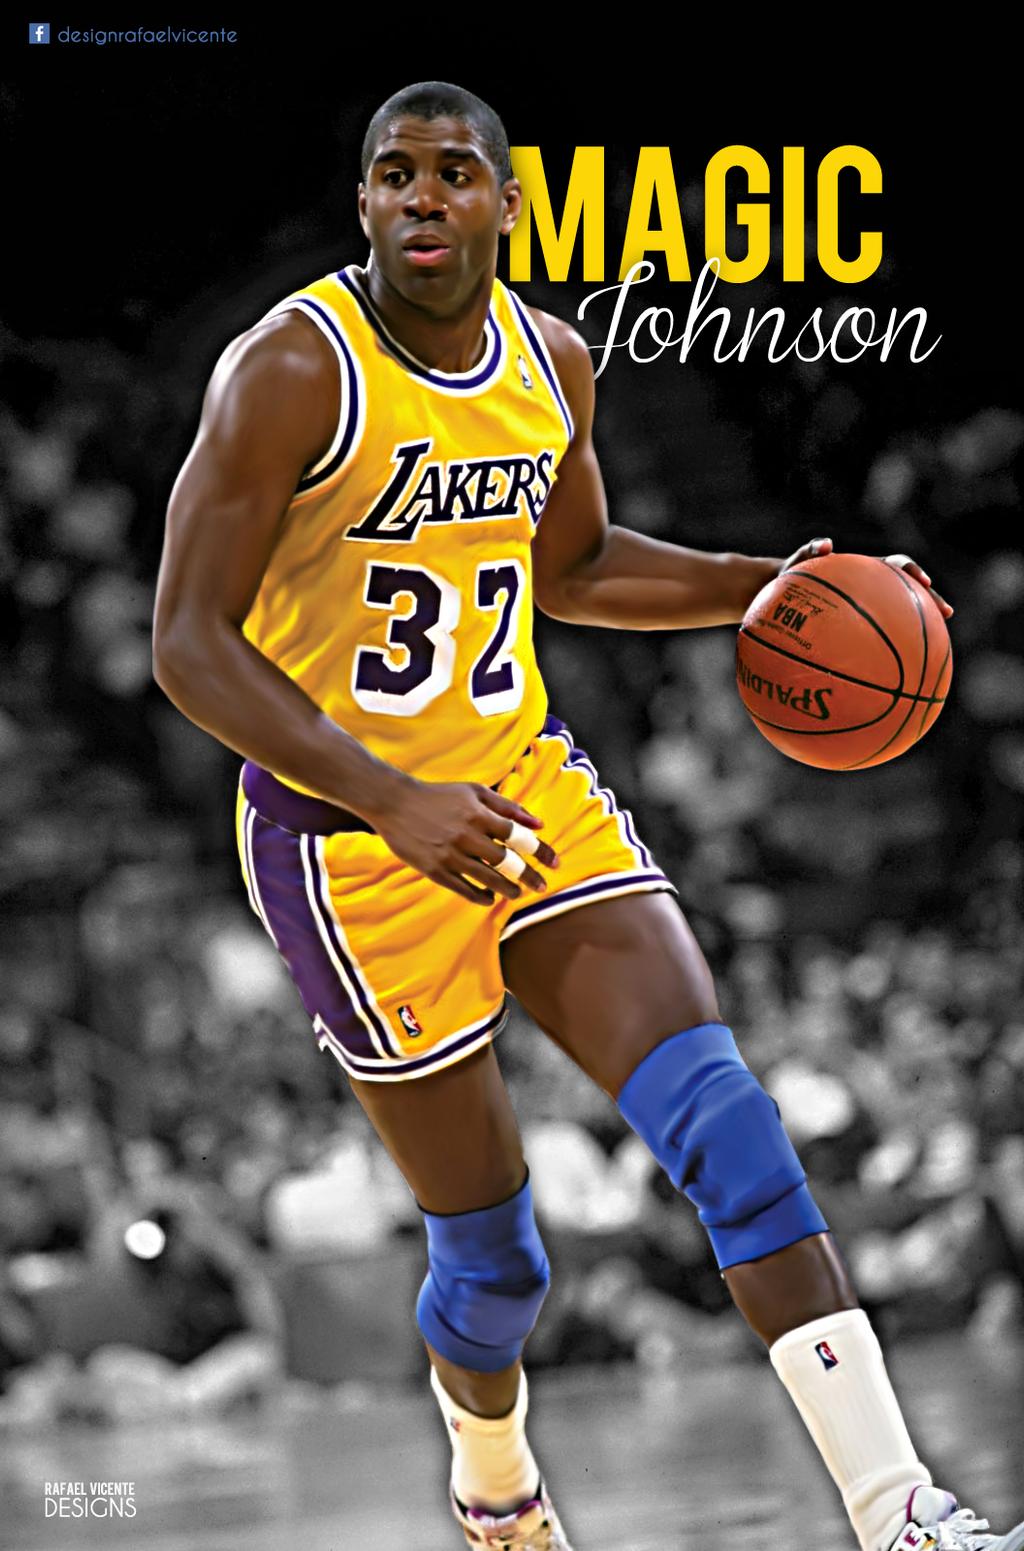 magic johnson pass - photo #10